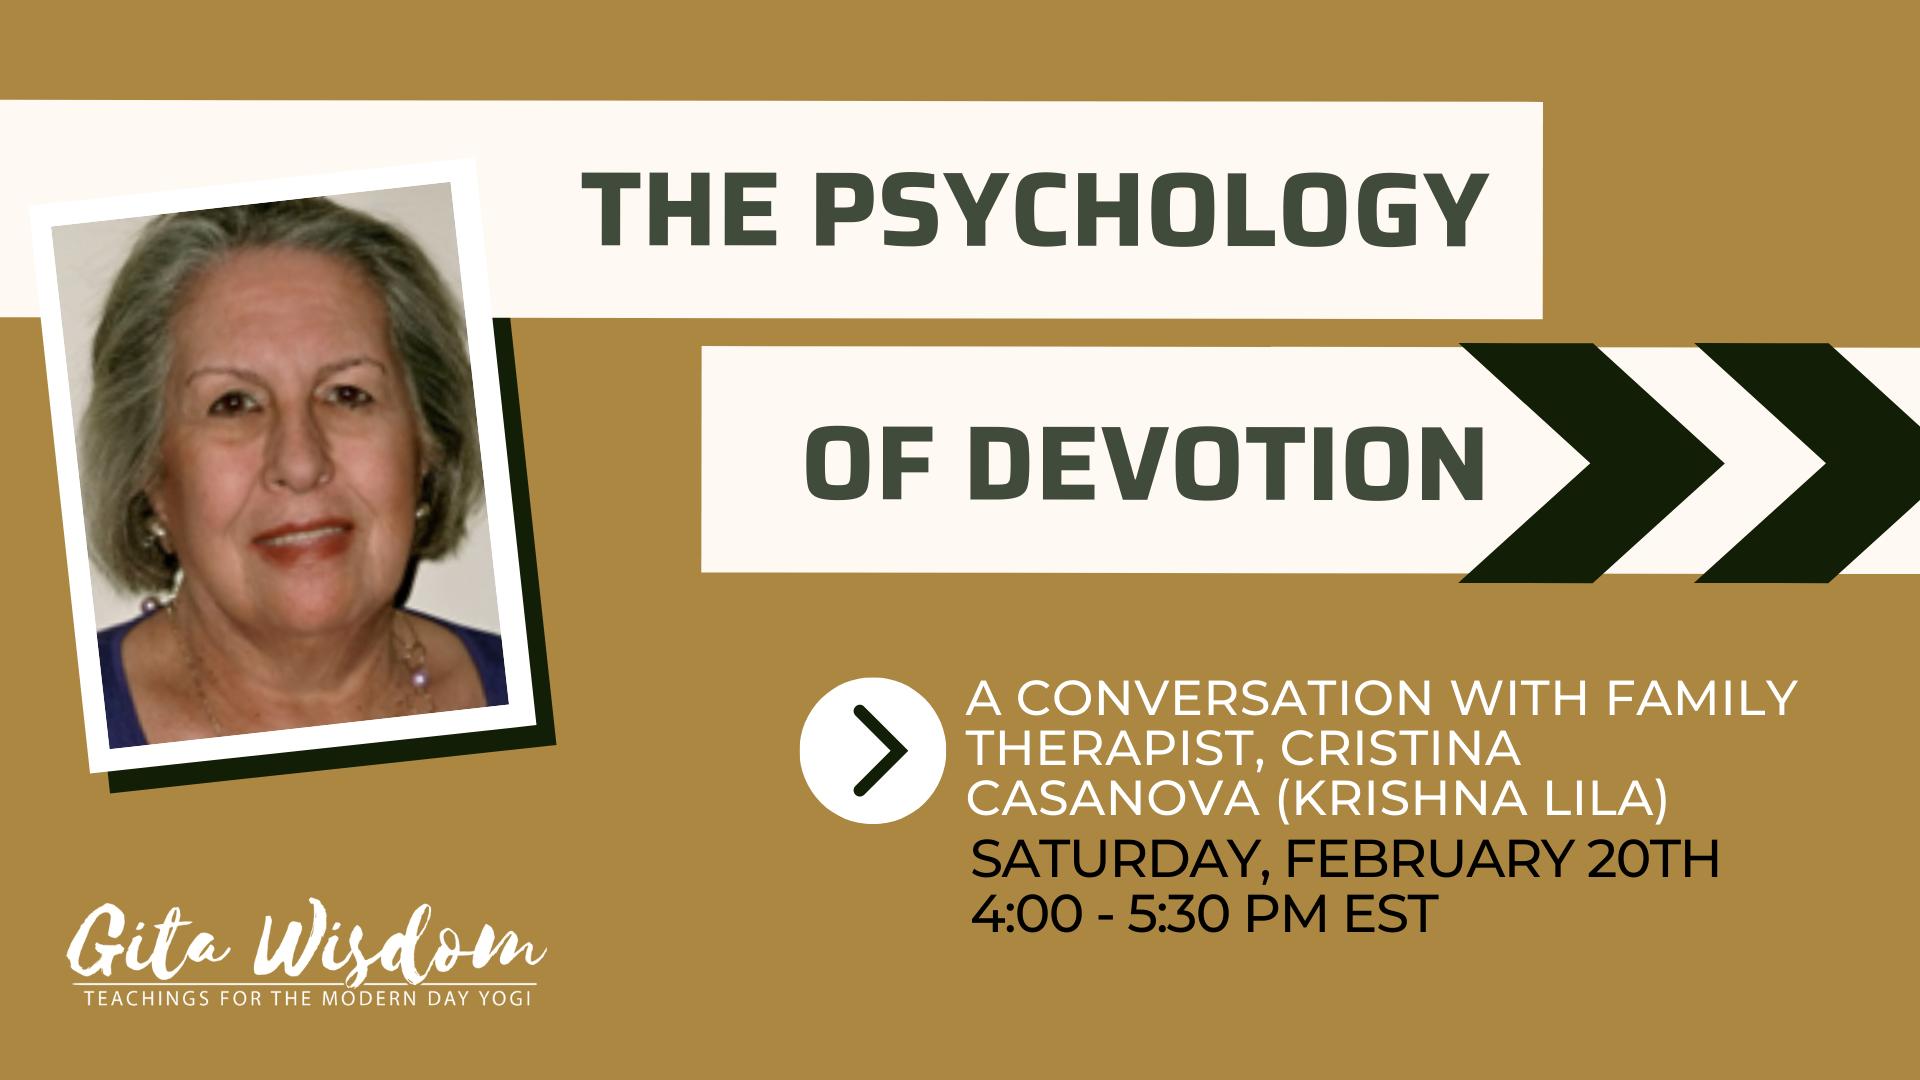 Promo for Psychology of Devotion